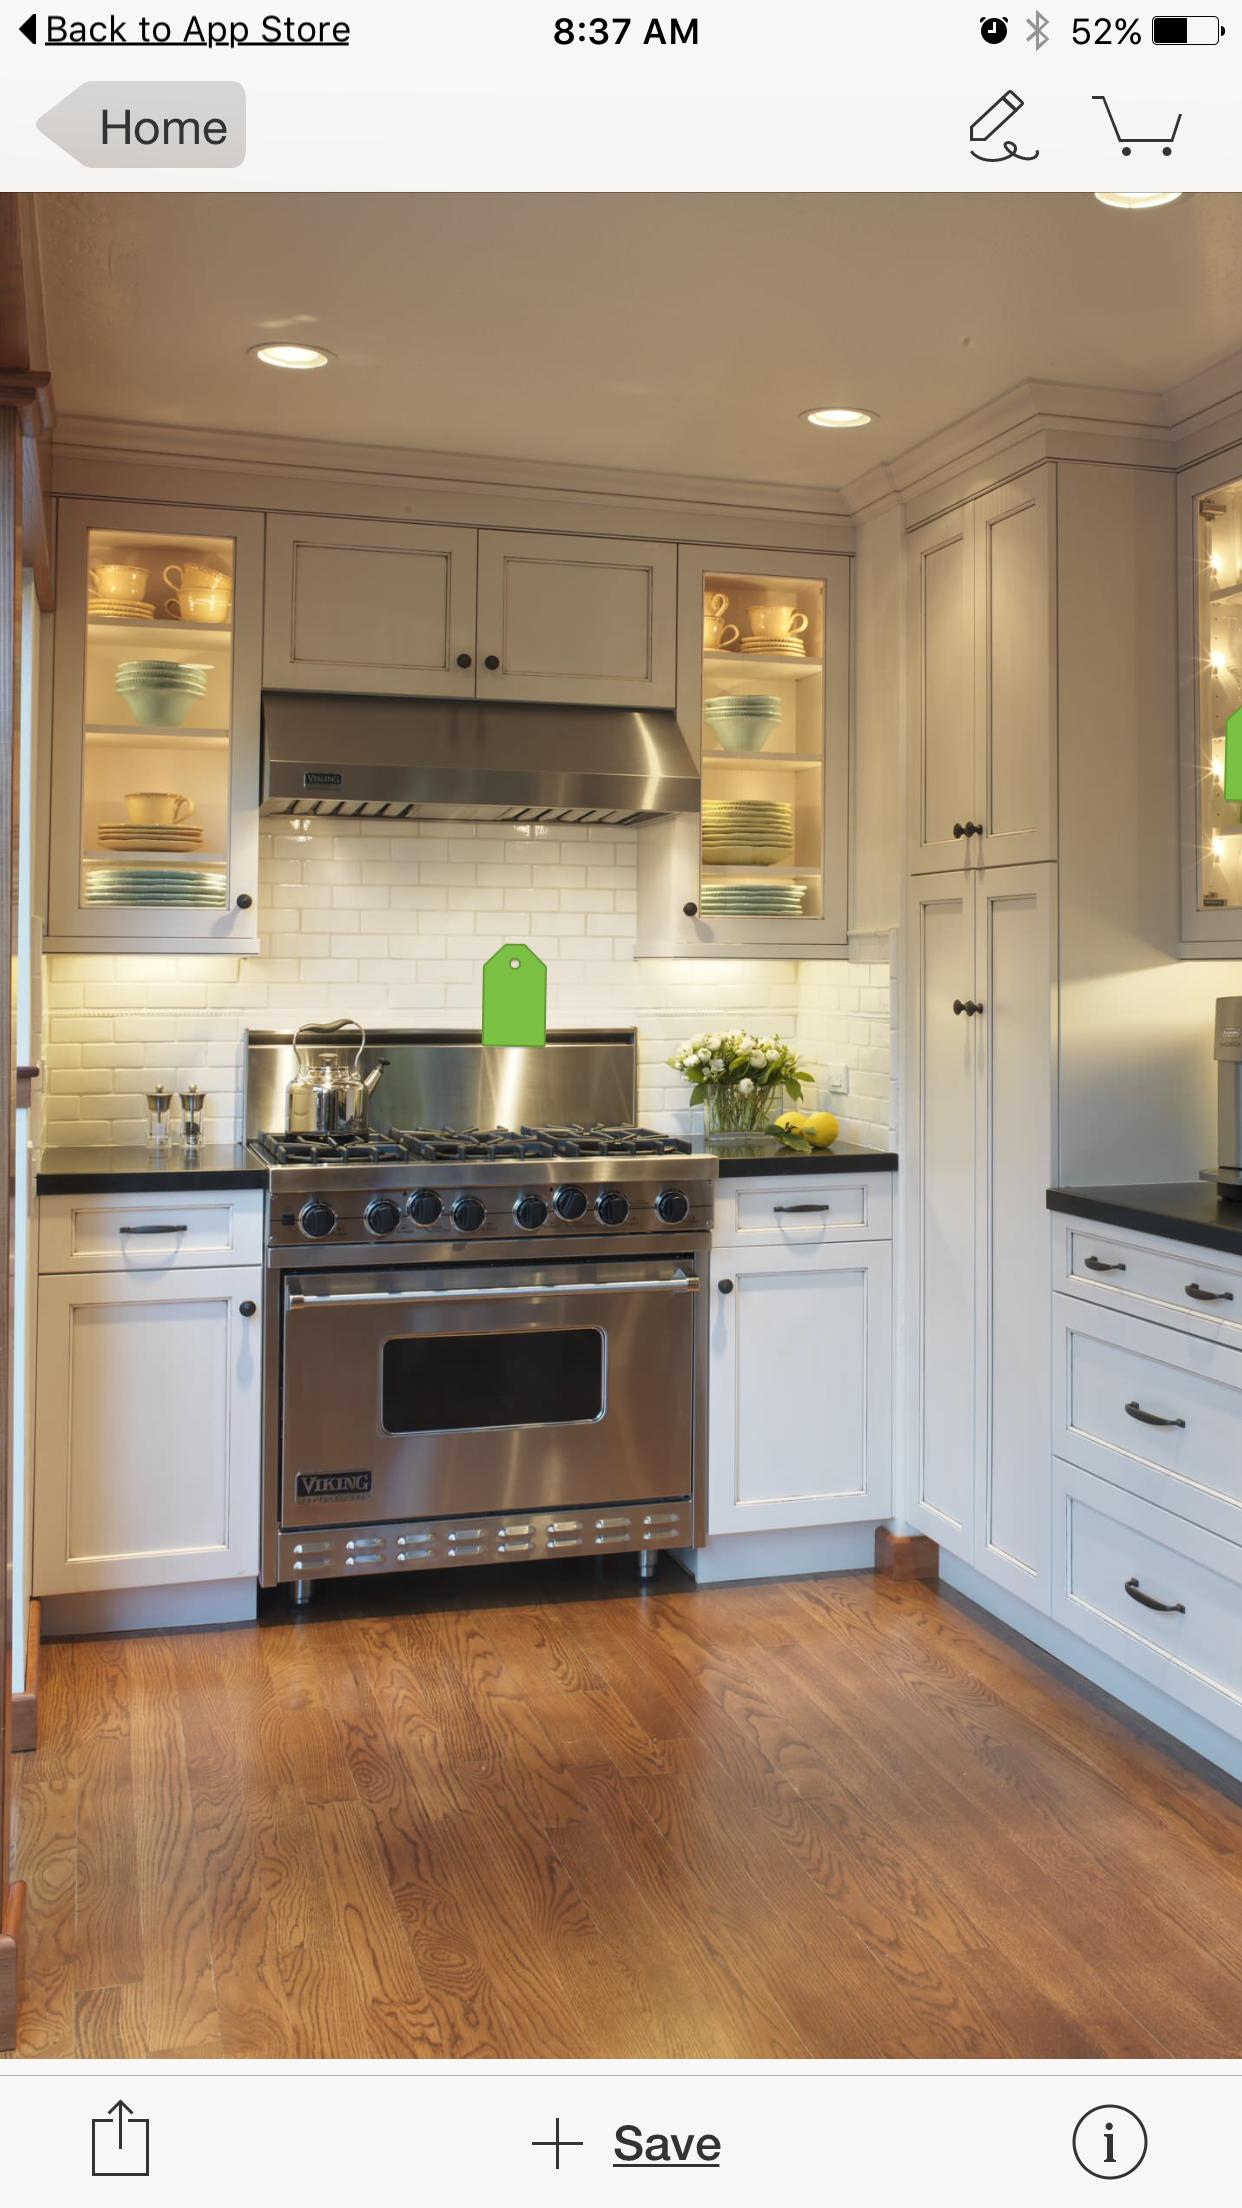 lglimitlessdesign contest small kitchen renovations kitchen renovation cost kitchen design on l kitchen remodel id=66908